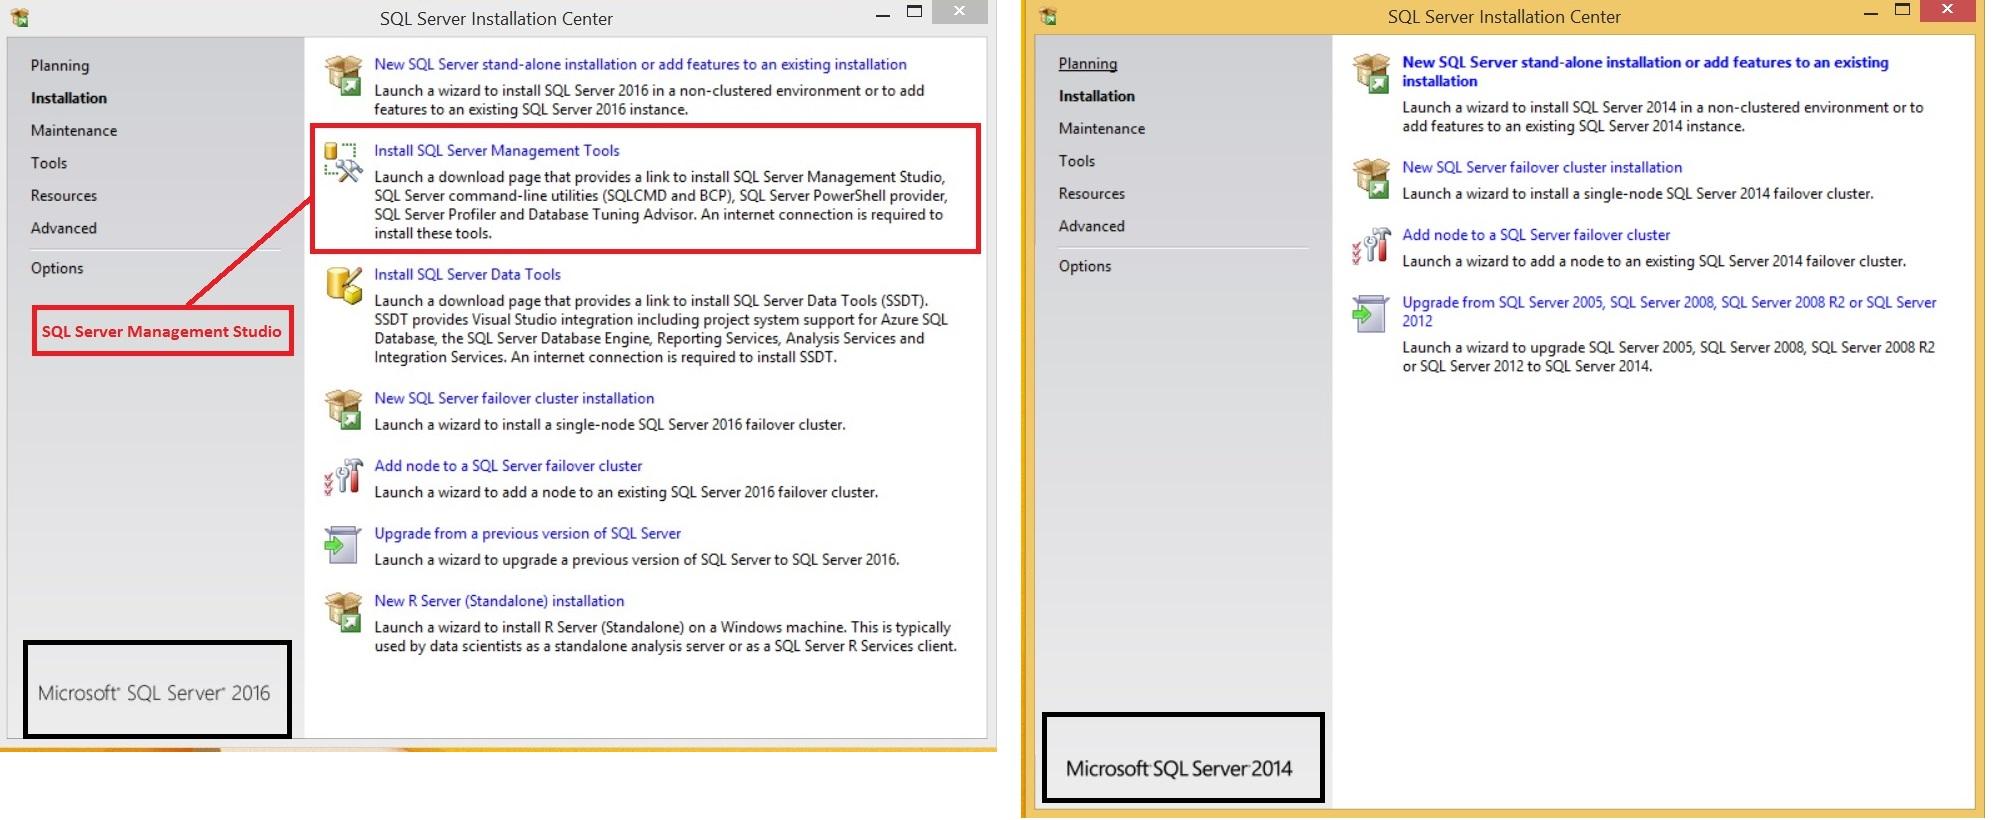 SQL Server 2016 vs SQL Server 2014 Installation - First screen comparison